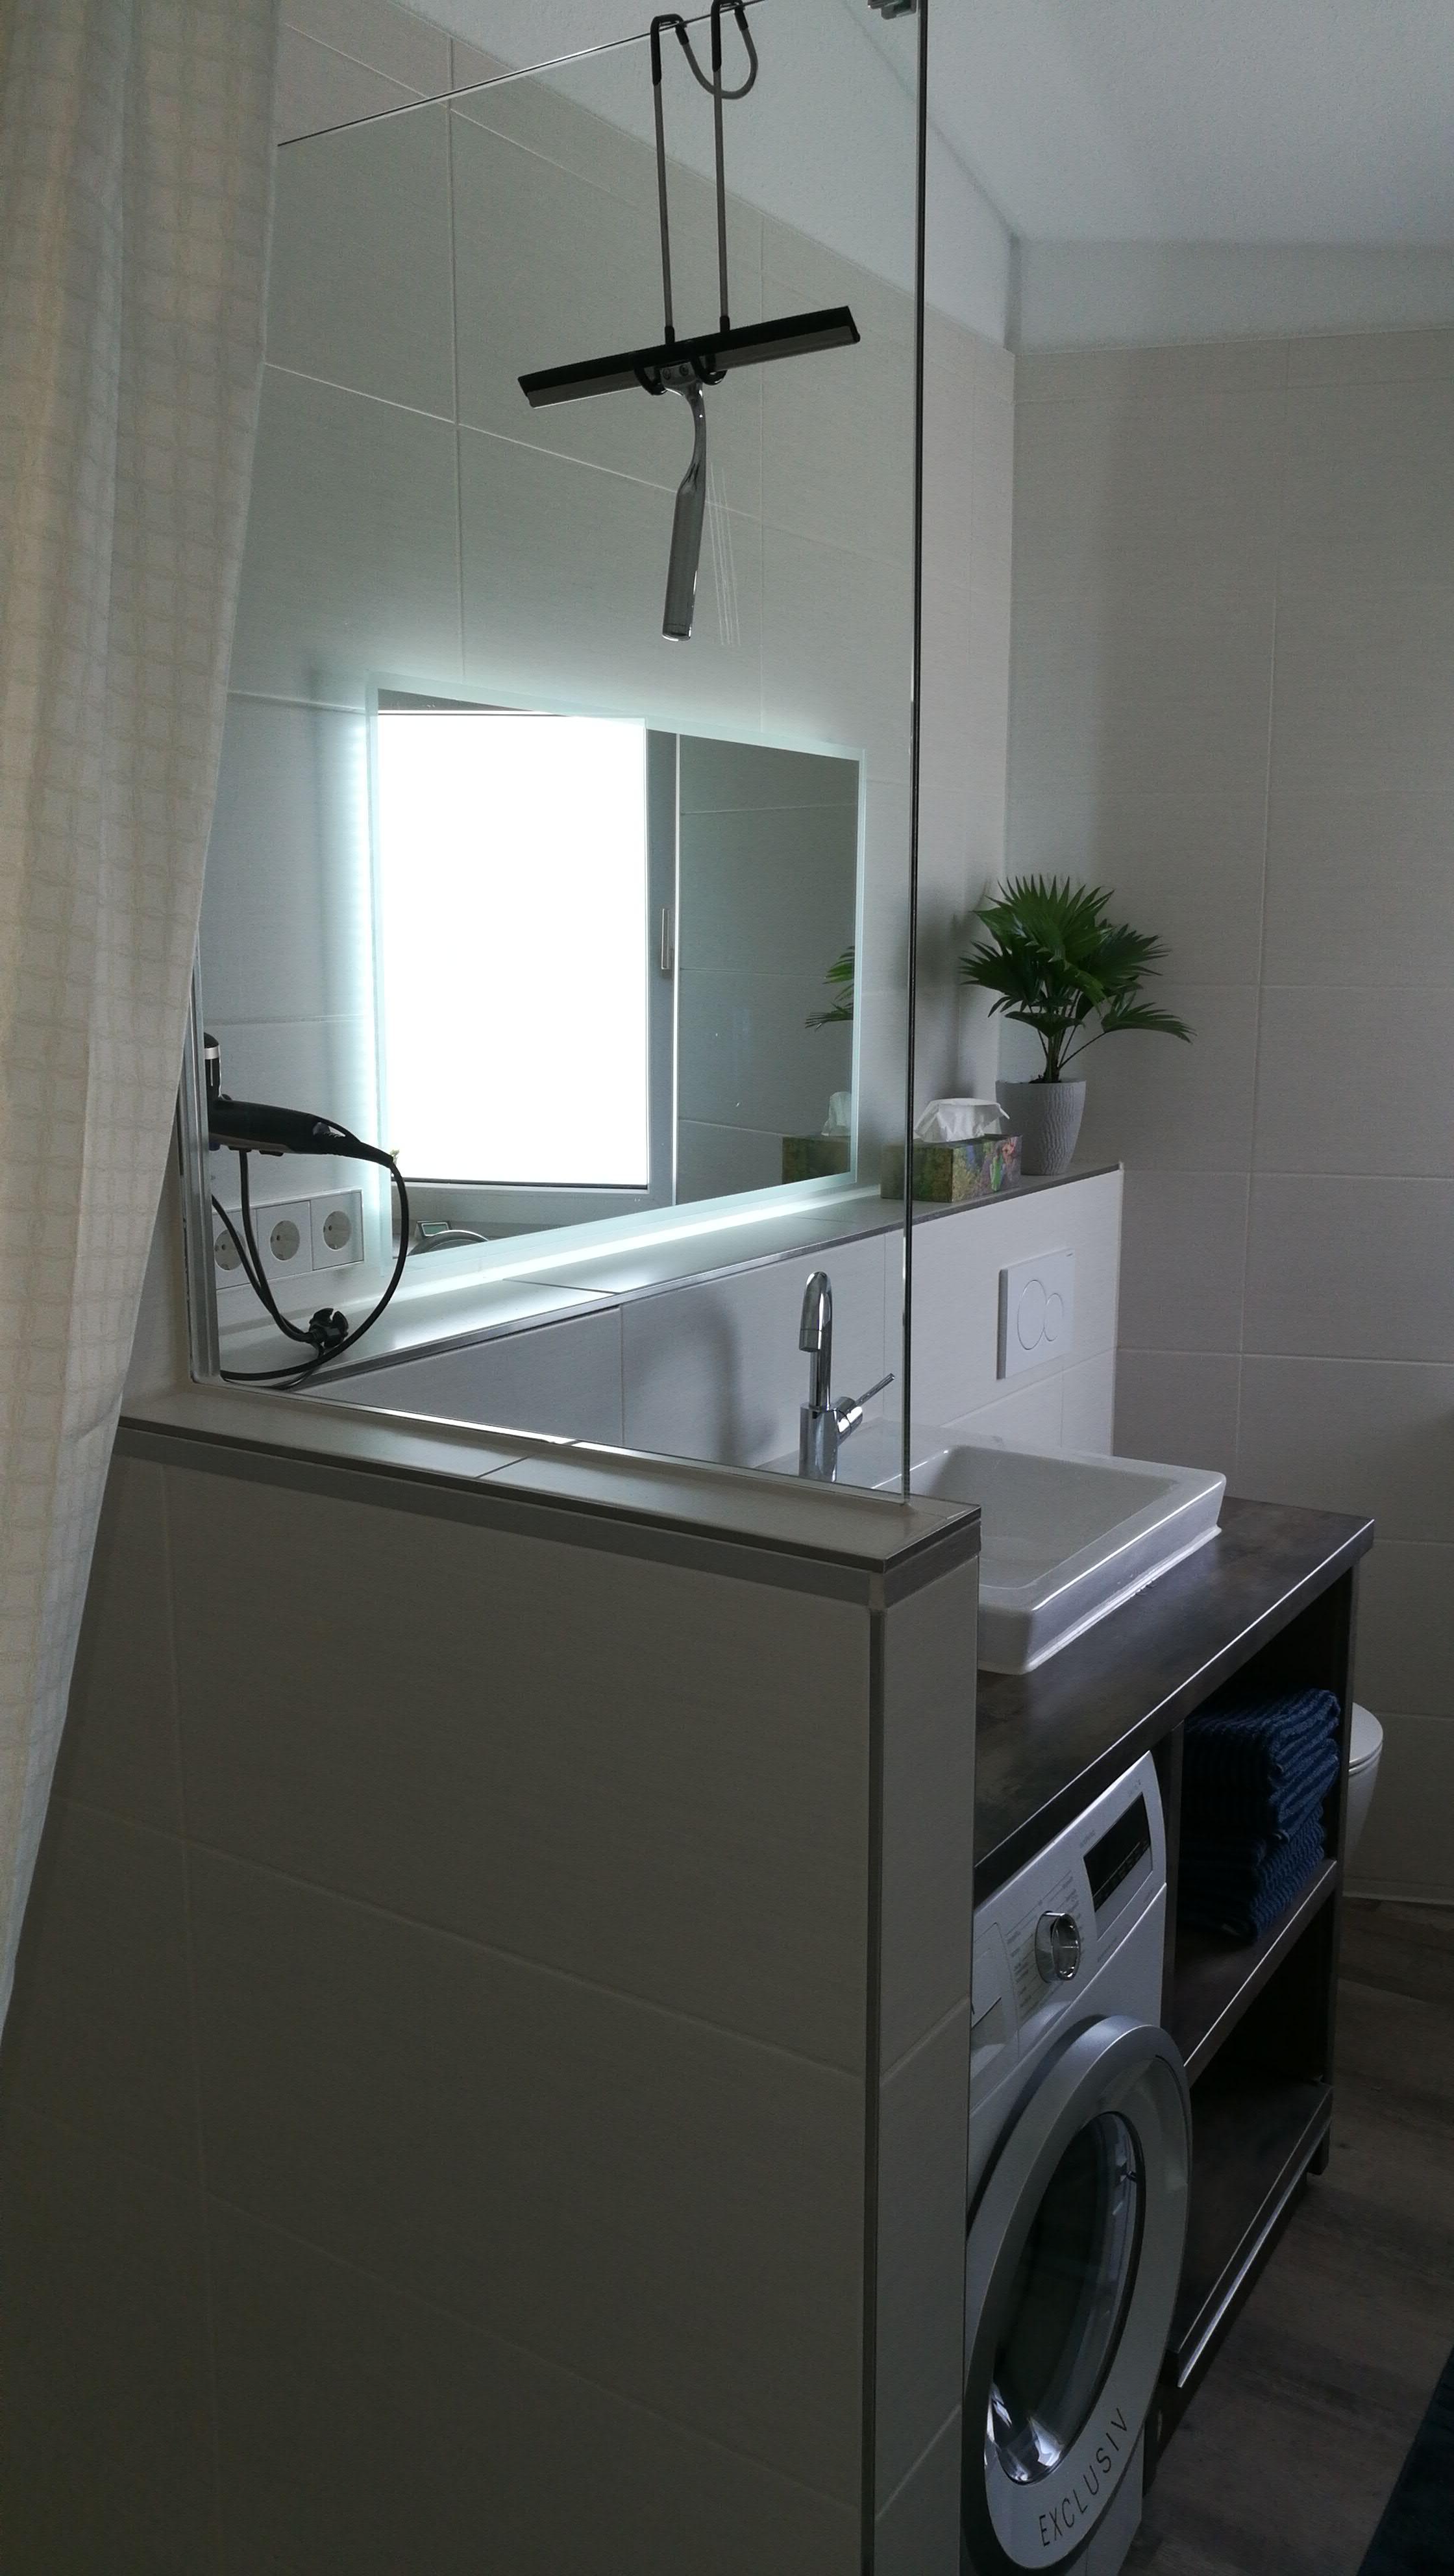 Lindenalpe 53, Badezimmer